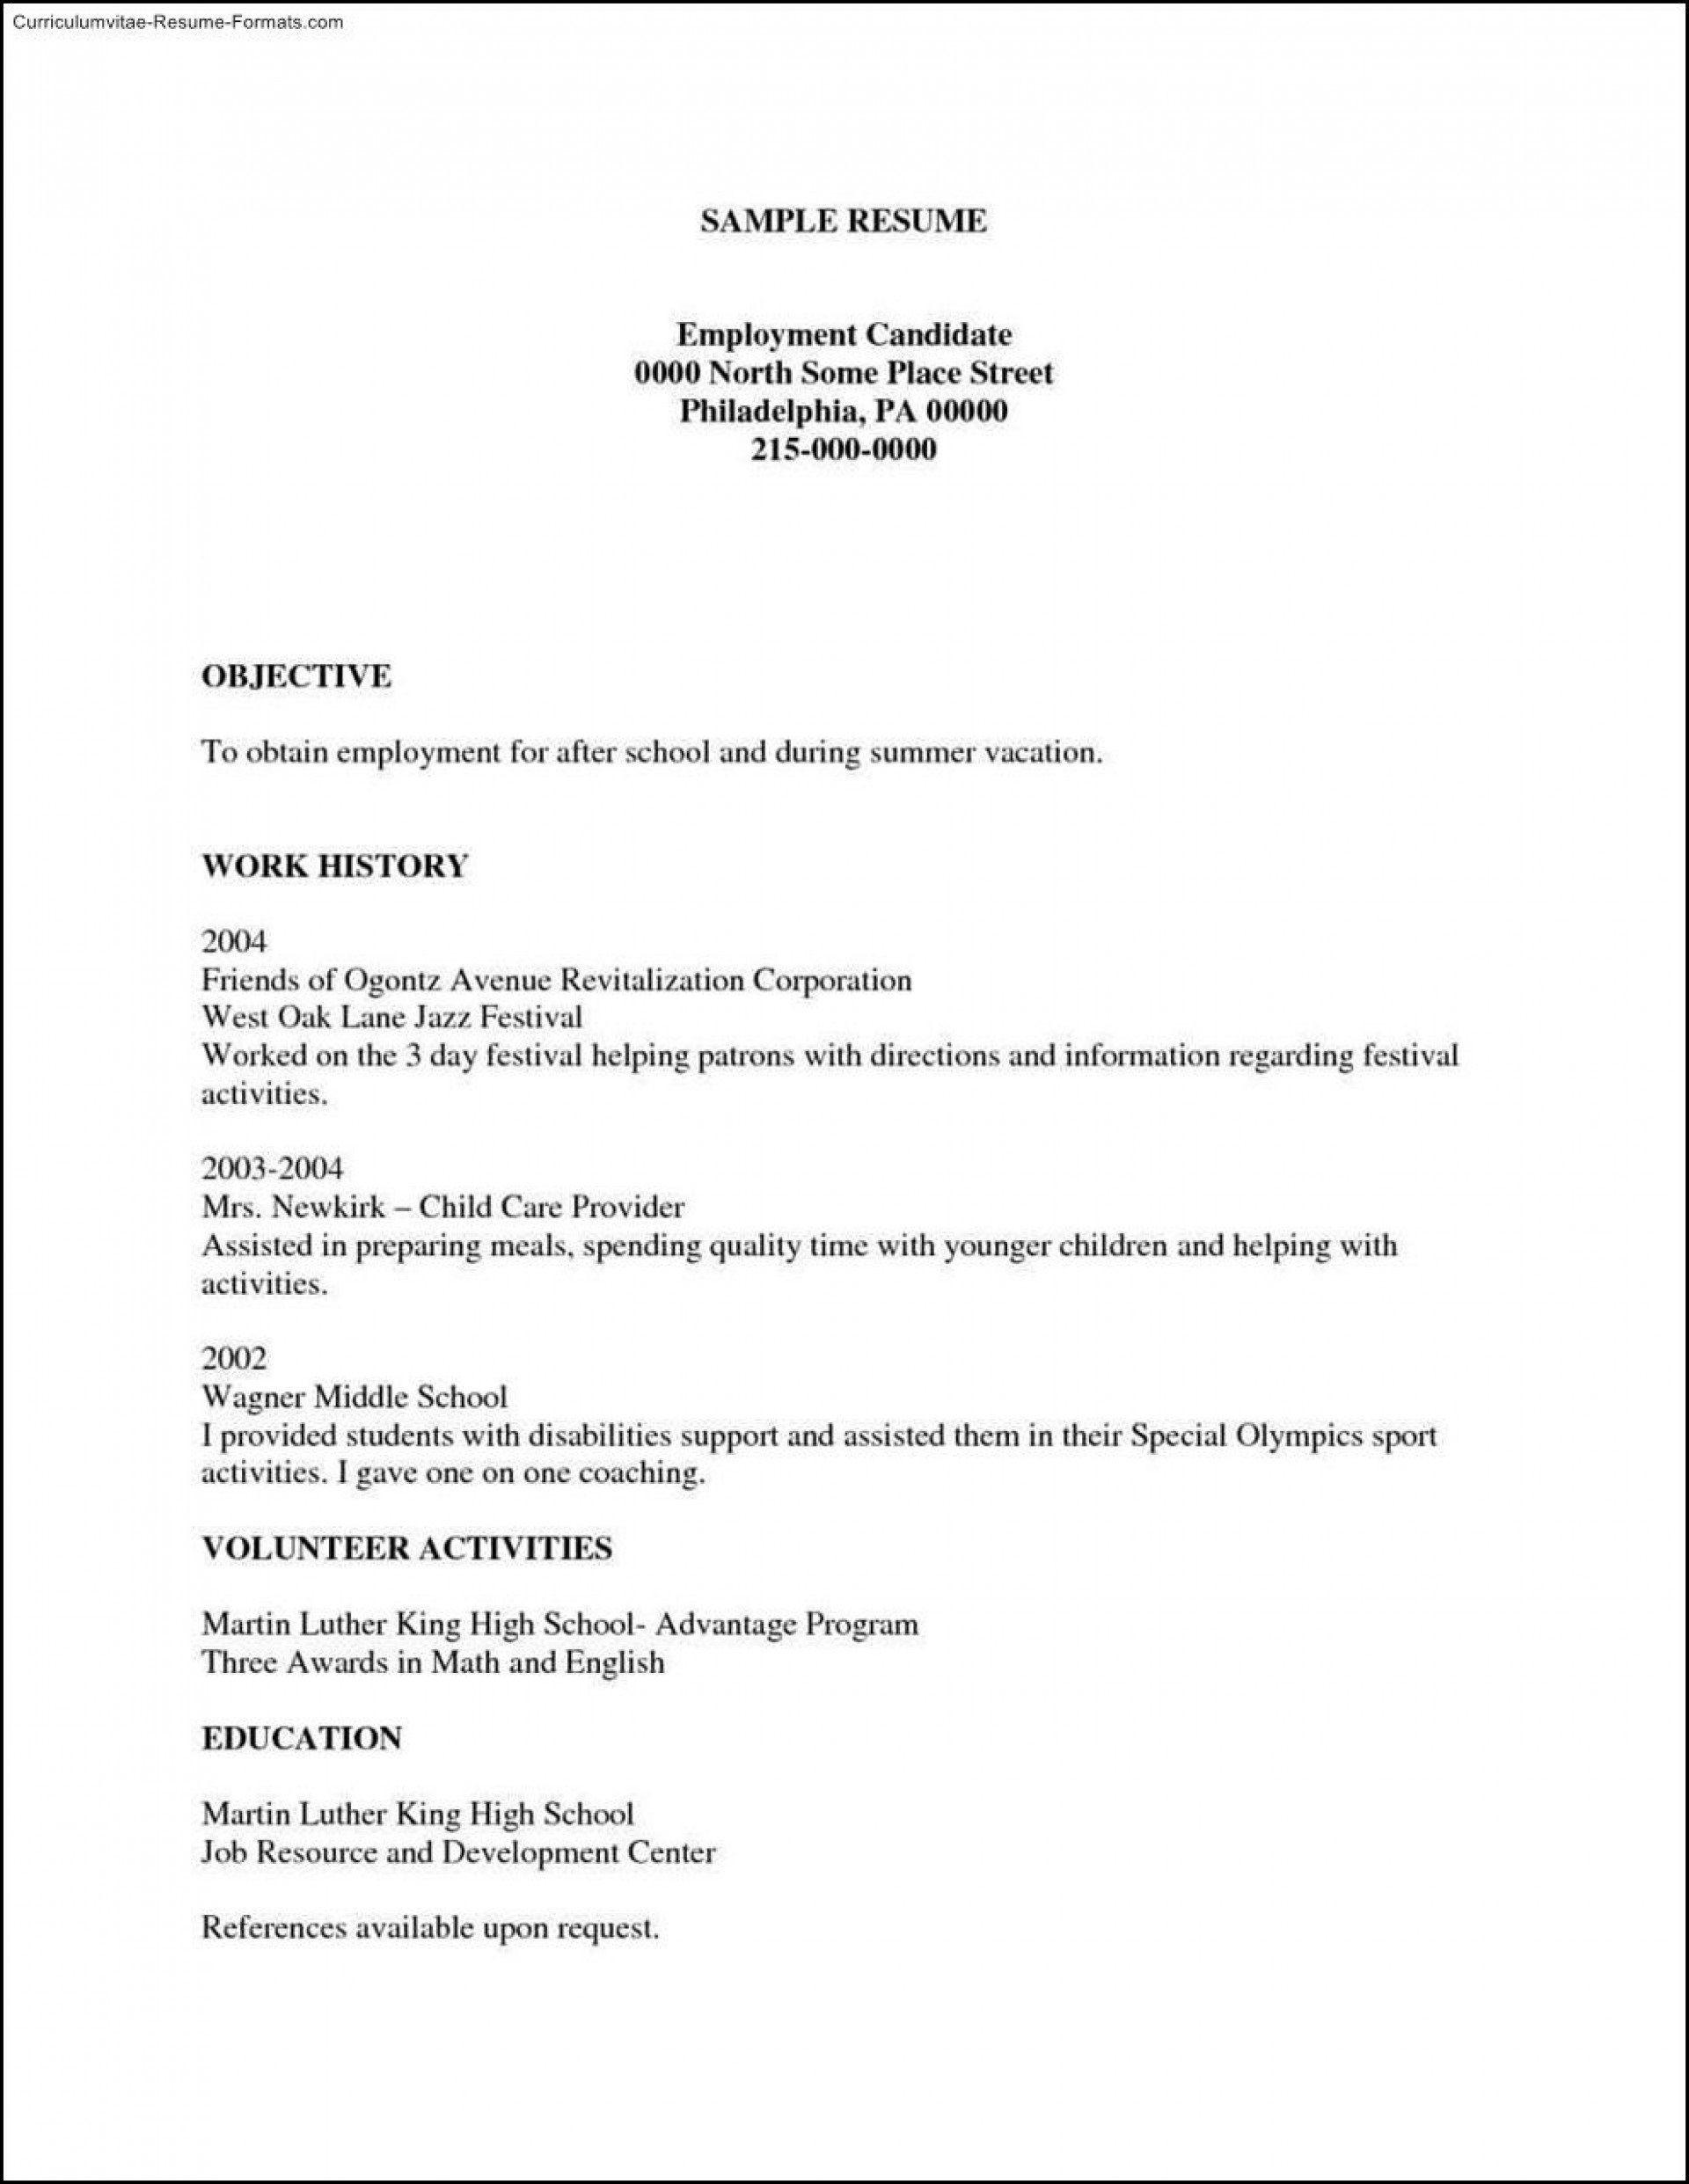 005 Simple Free Basic Blank Resume Template Image  Templates Word Printable To Print1920